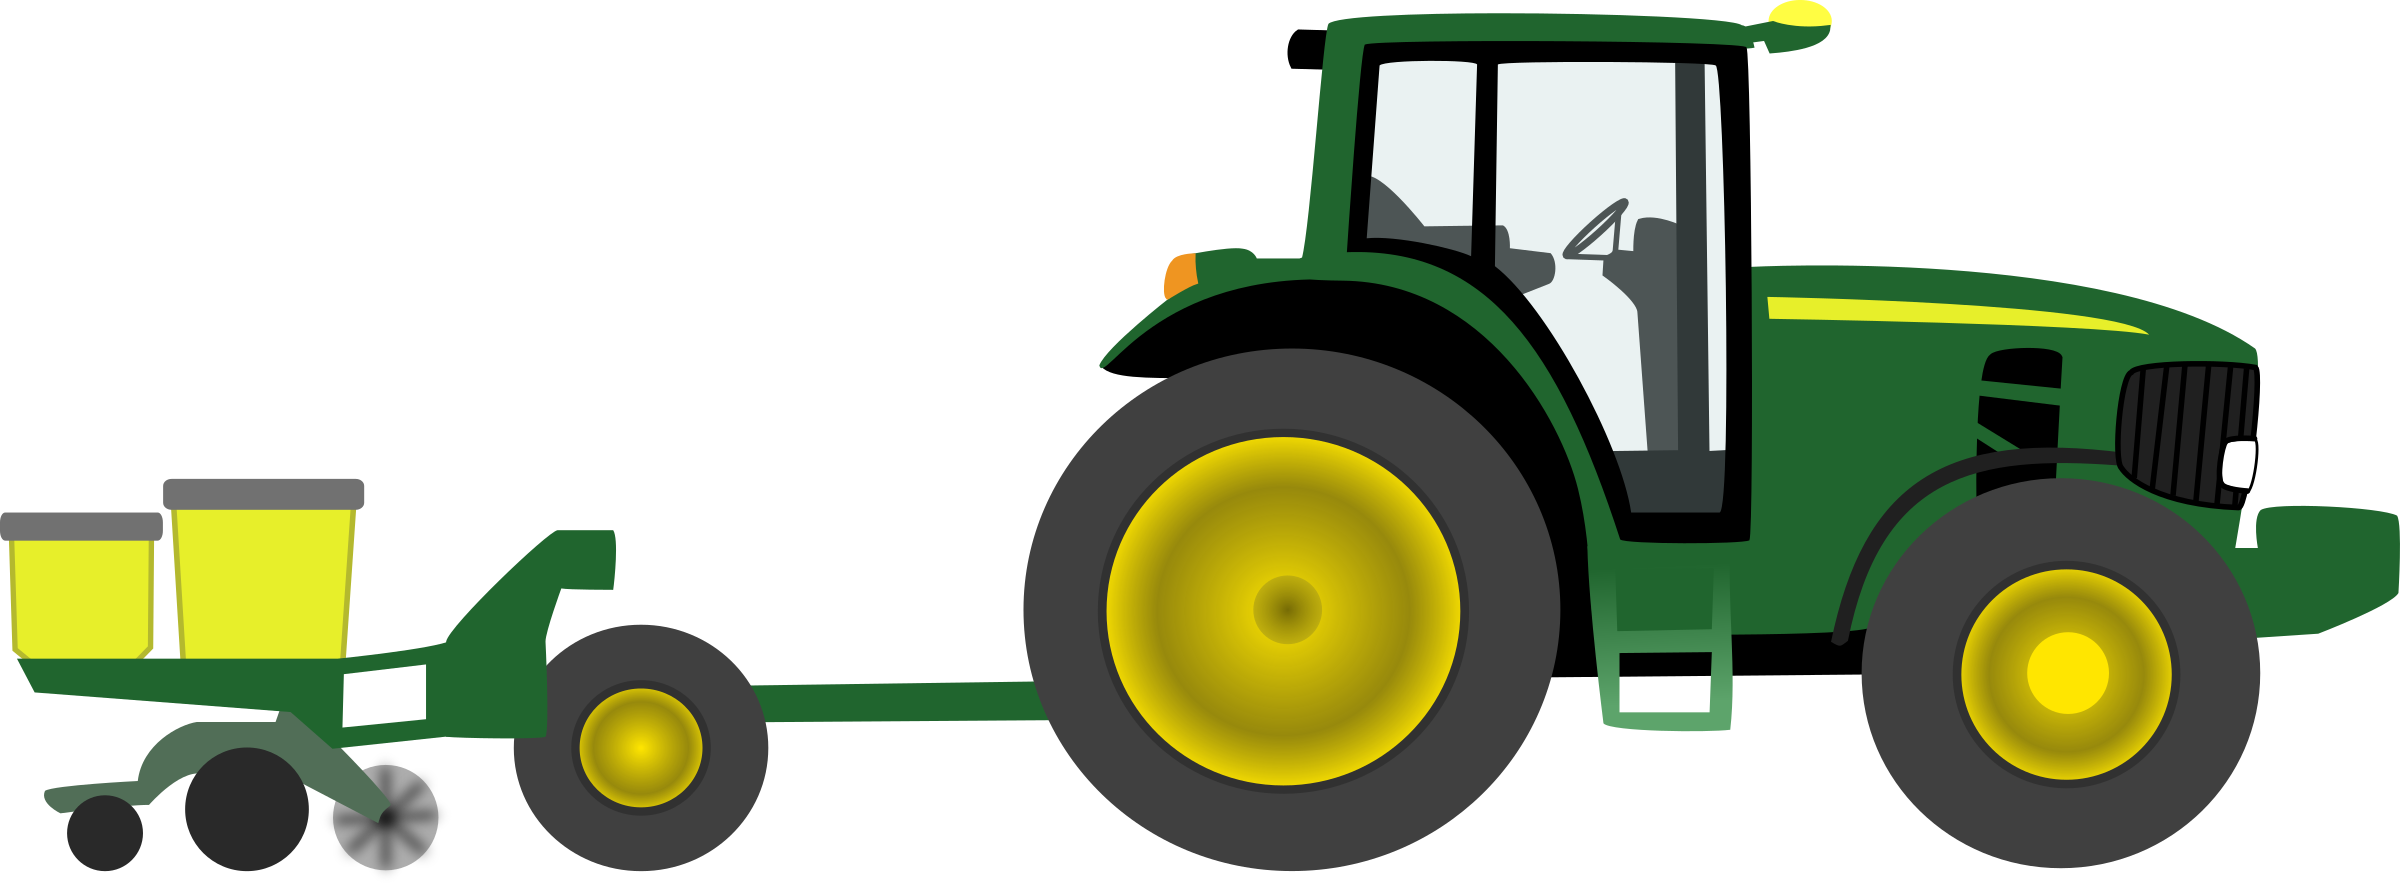 Tractor PNG Transparent Image SVG Clip arts